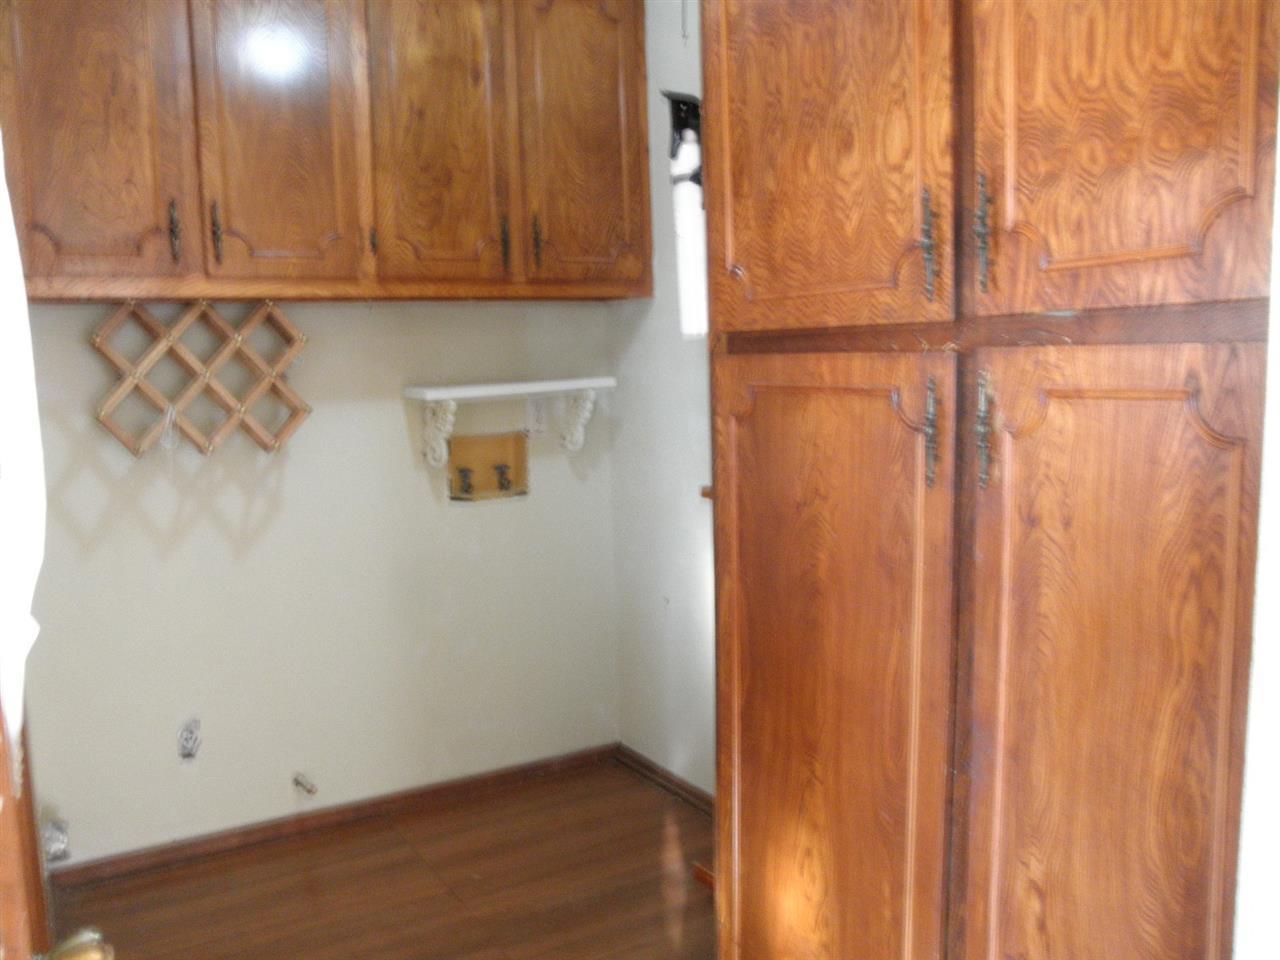 Sold Cross Sale W/ MLS | 2516 Oriole  Ponca City, OK 74601 12